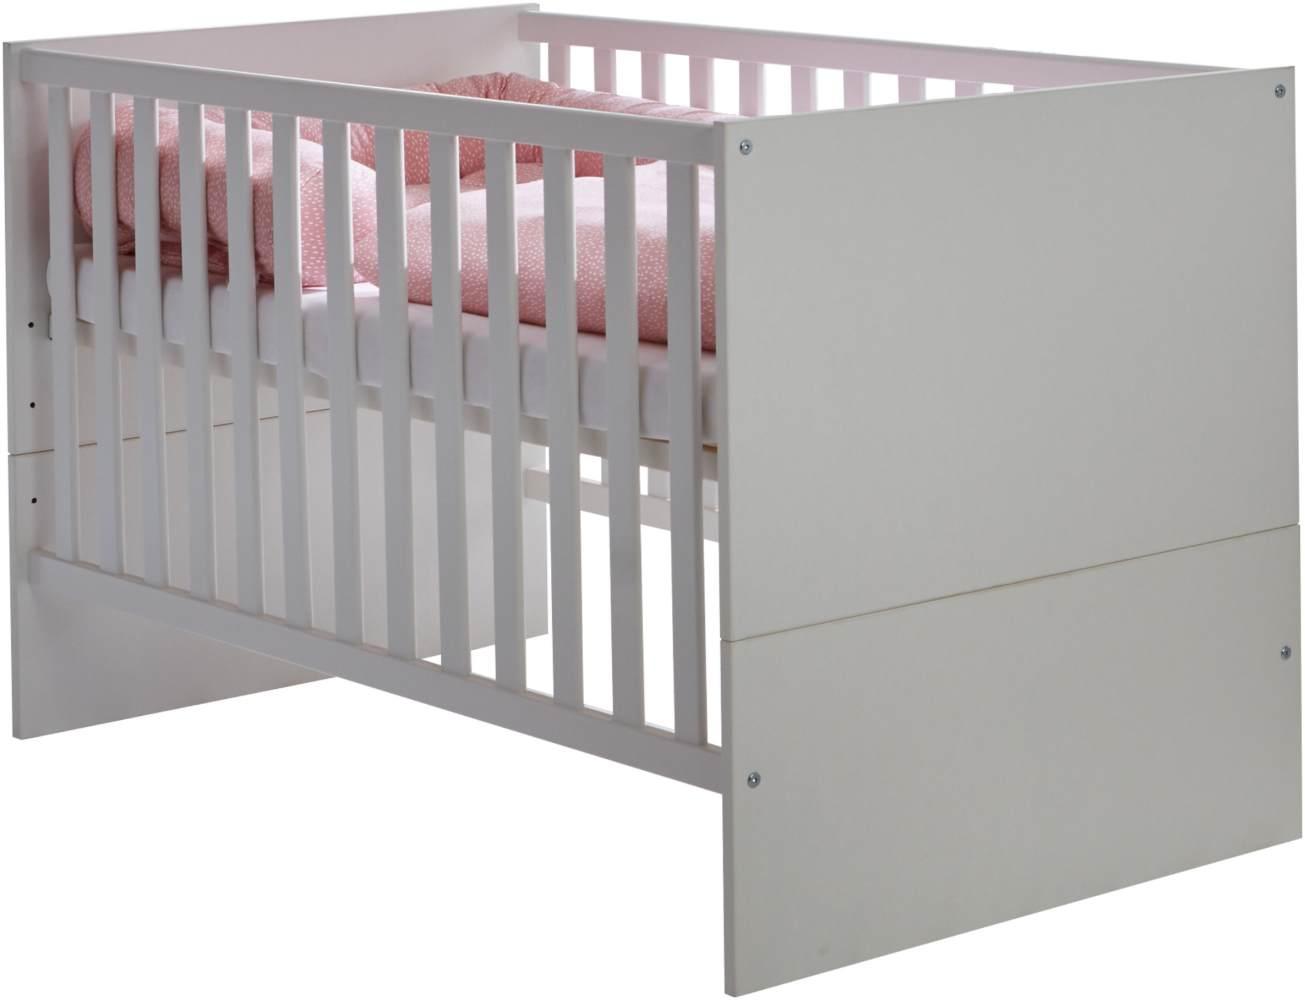 Arthur Berndt 'Amal' Kinderbett 70 x 140 cm inkl. Lattenrost 4-fach höhenverstellbar Kreideweiß Bild 1